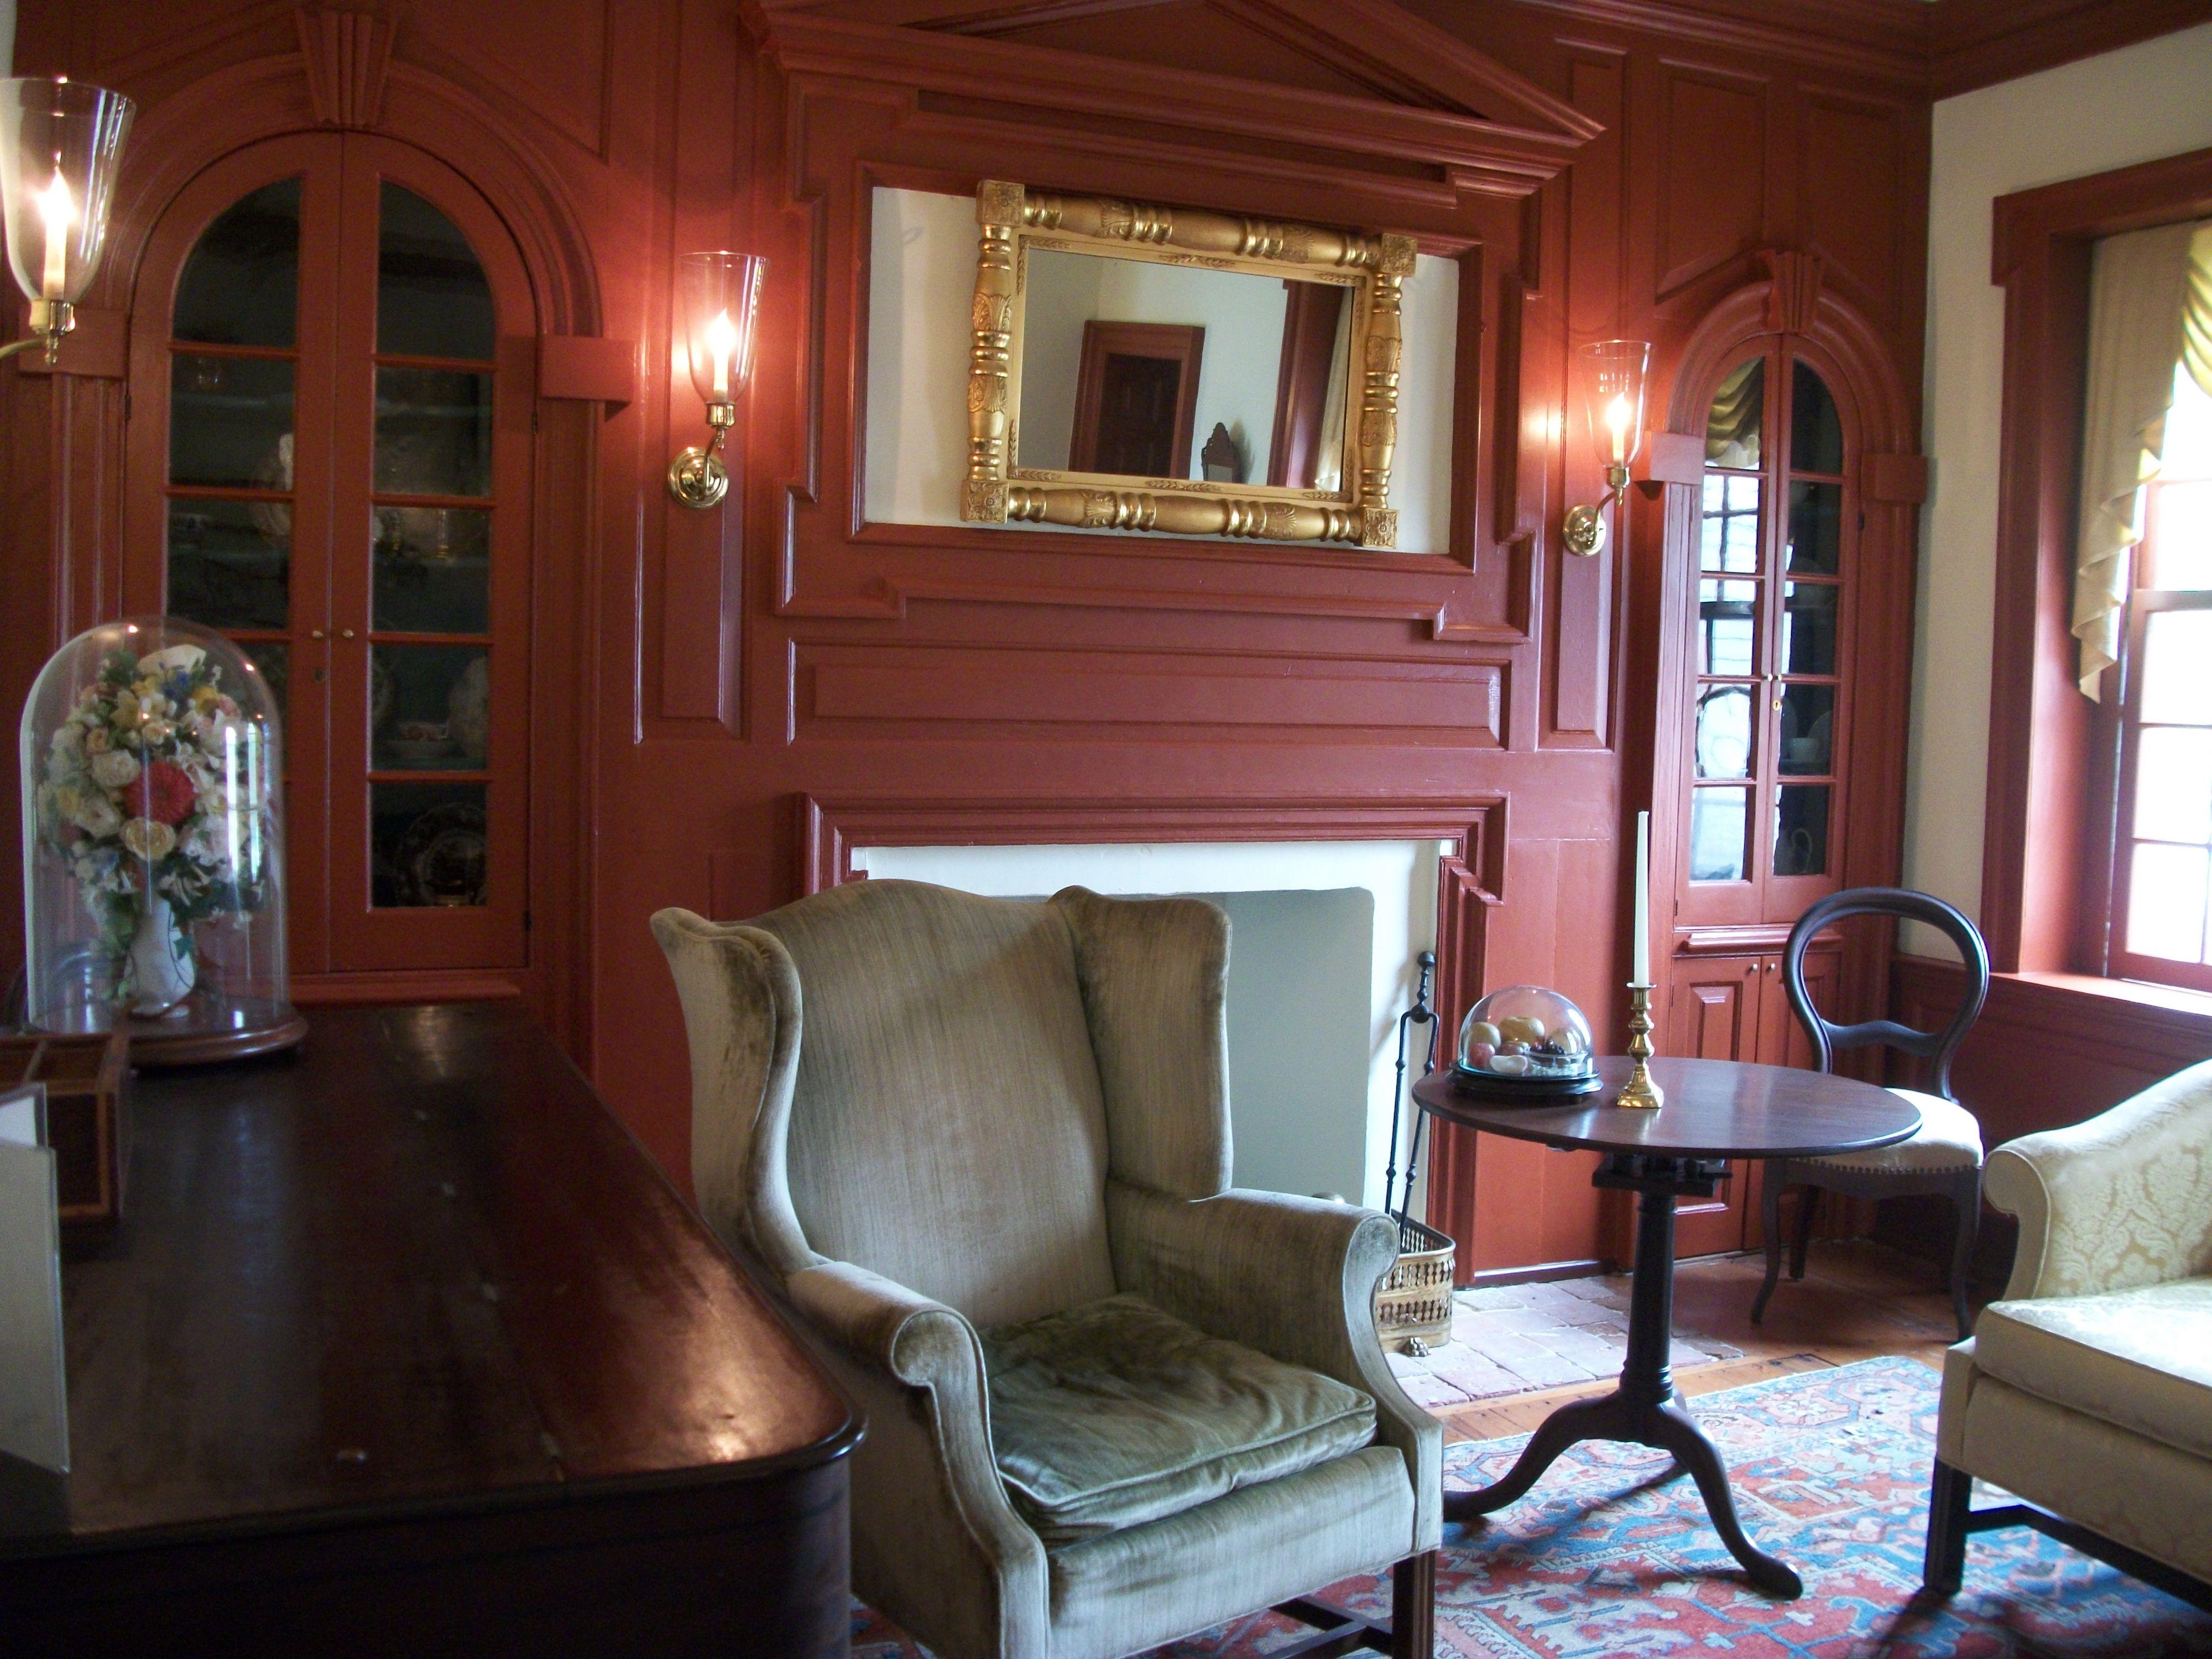 Interior of the Parson Thorne Mansion